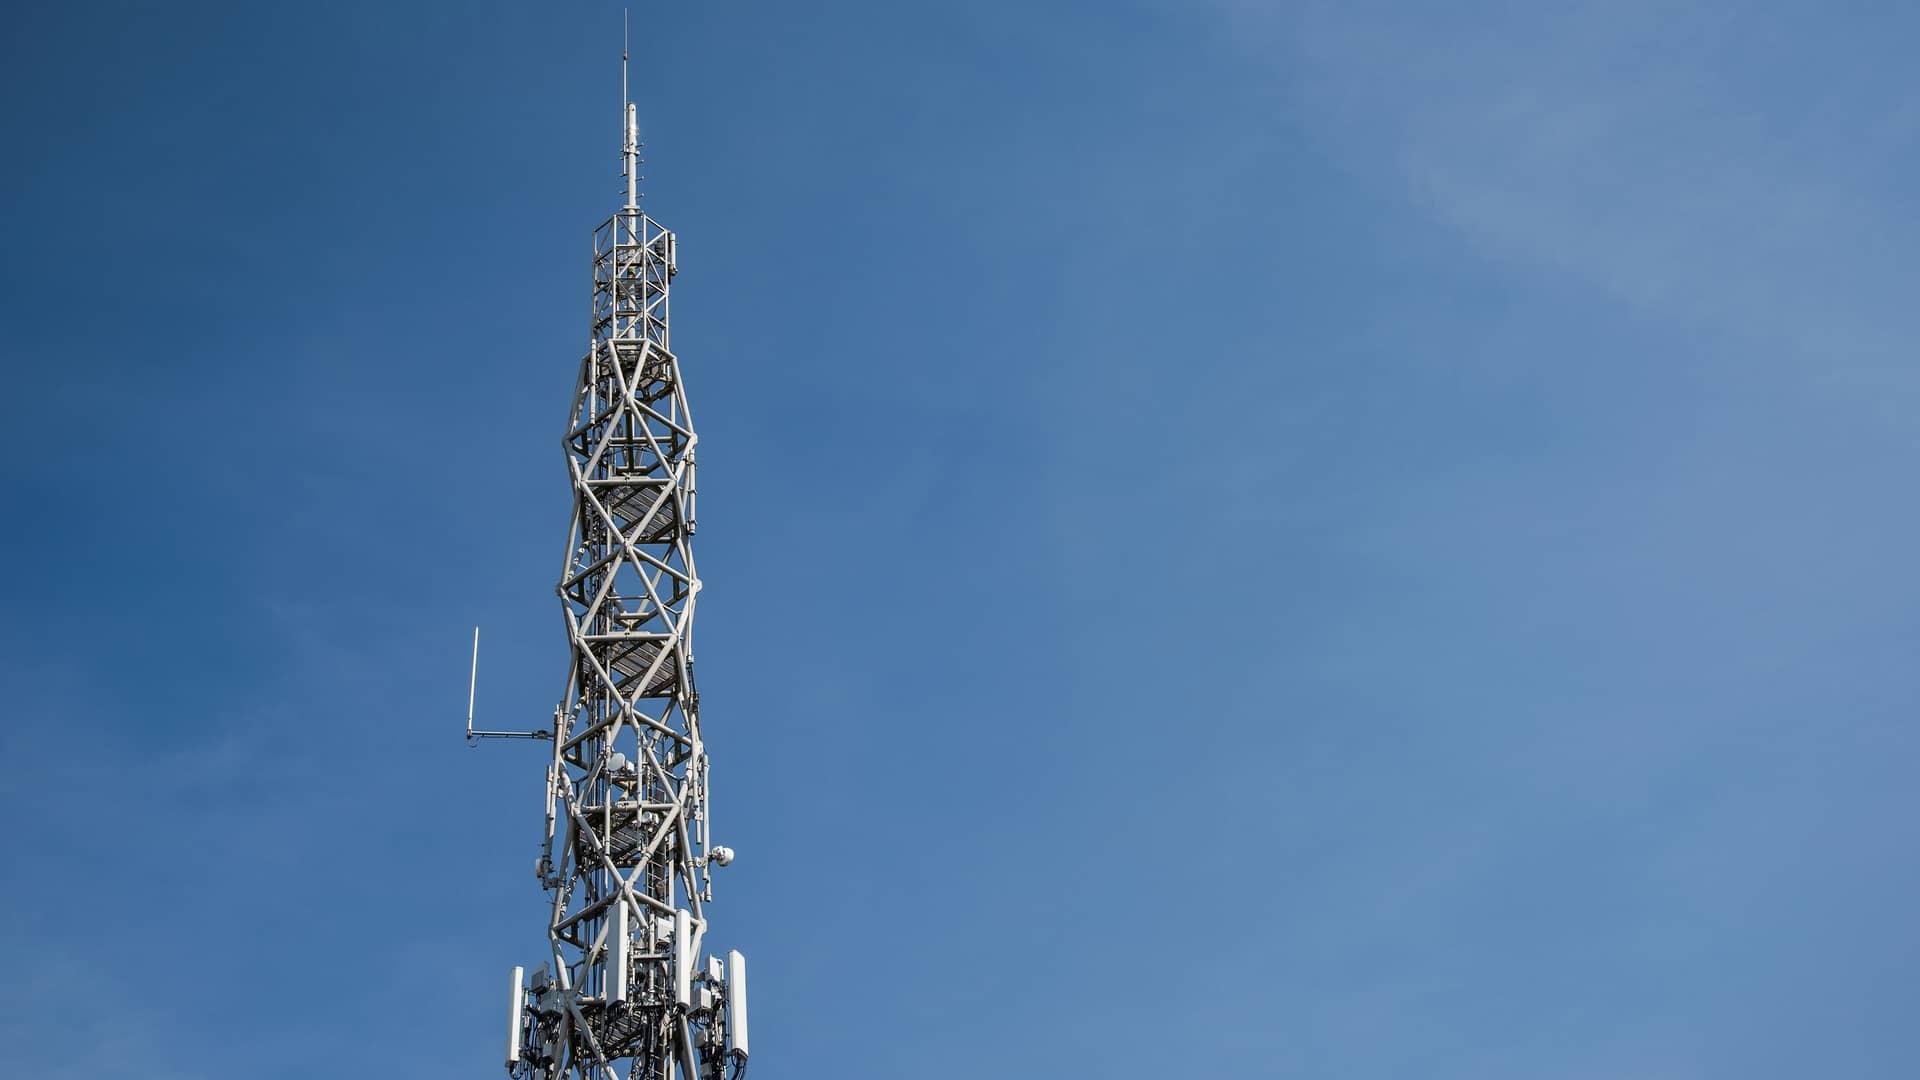 Antena de telecomunicaciones simboliza cobertura de telecable